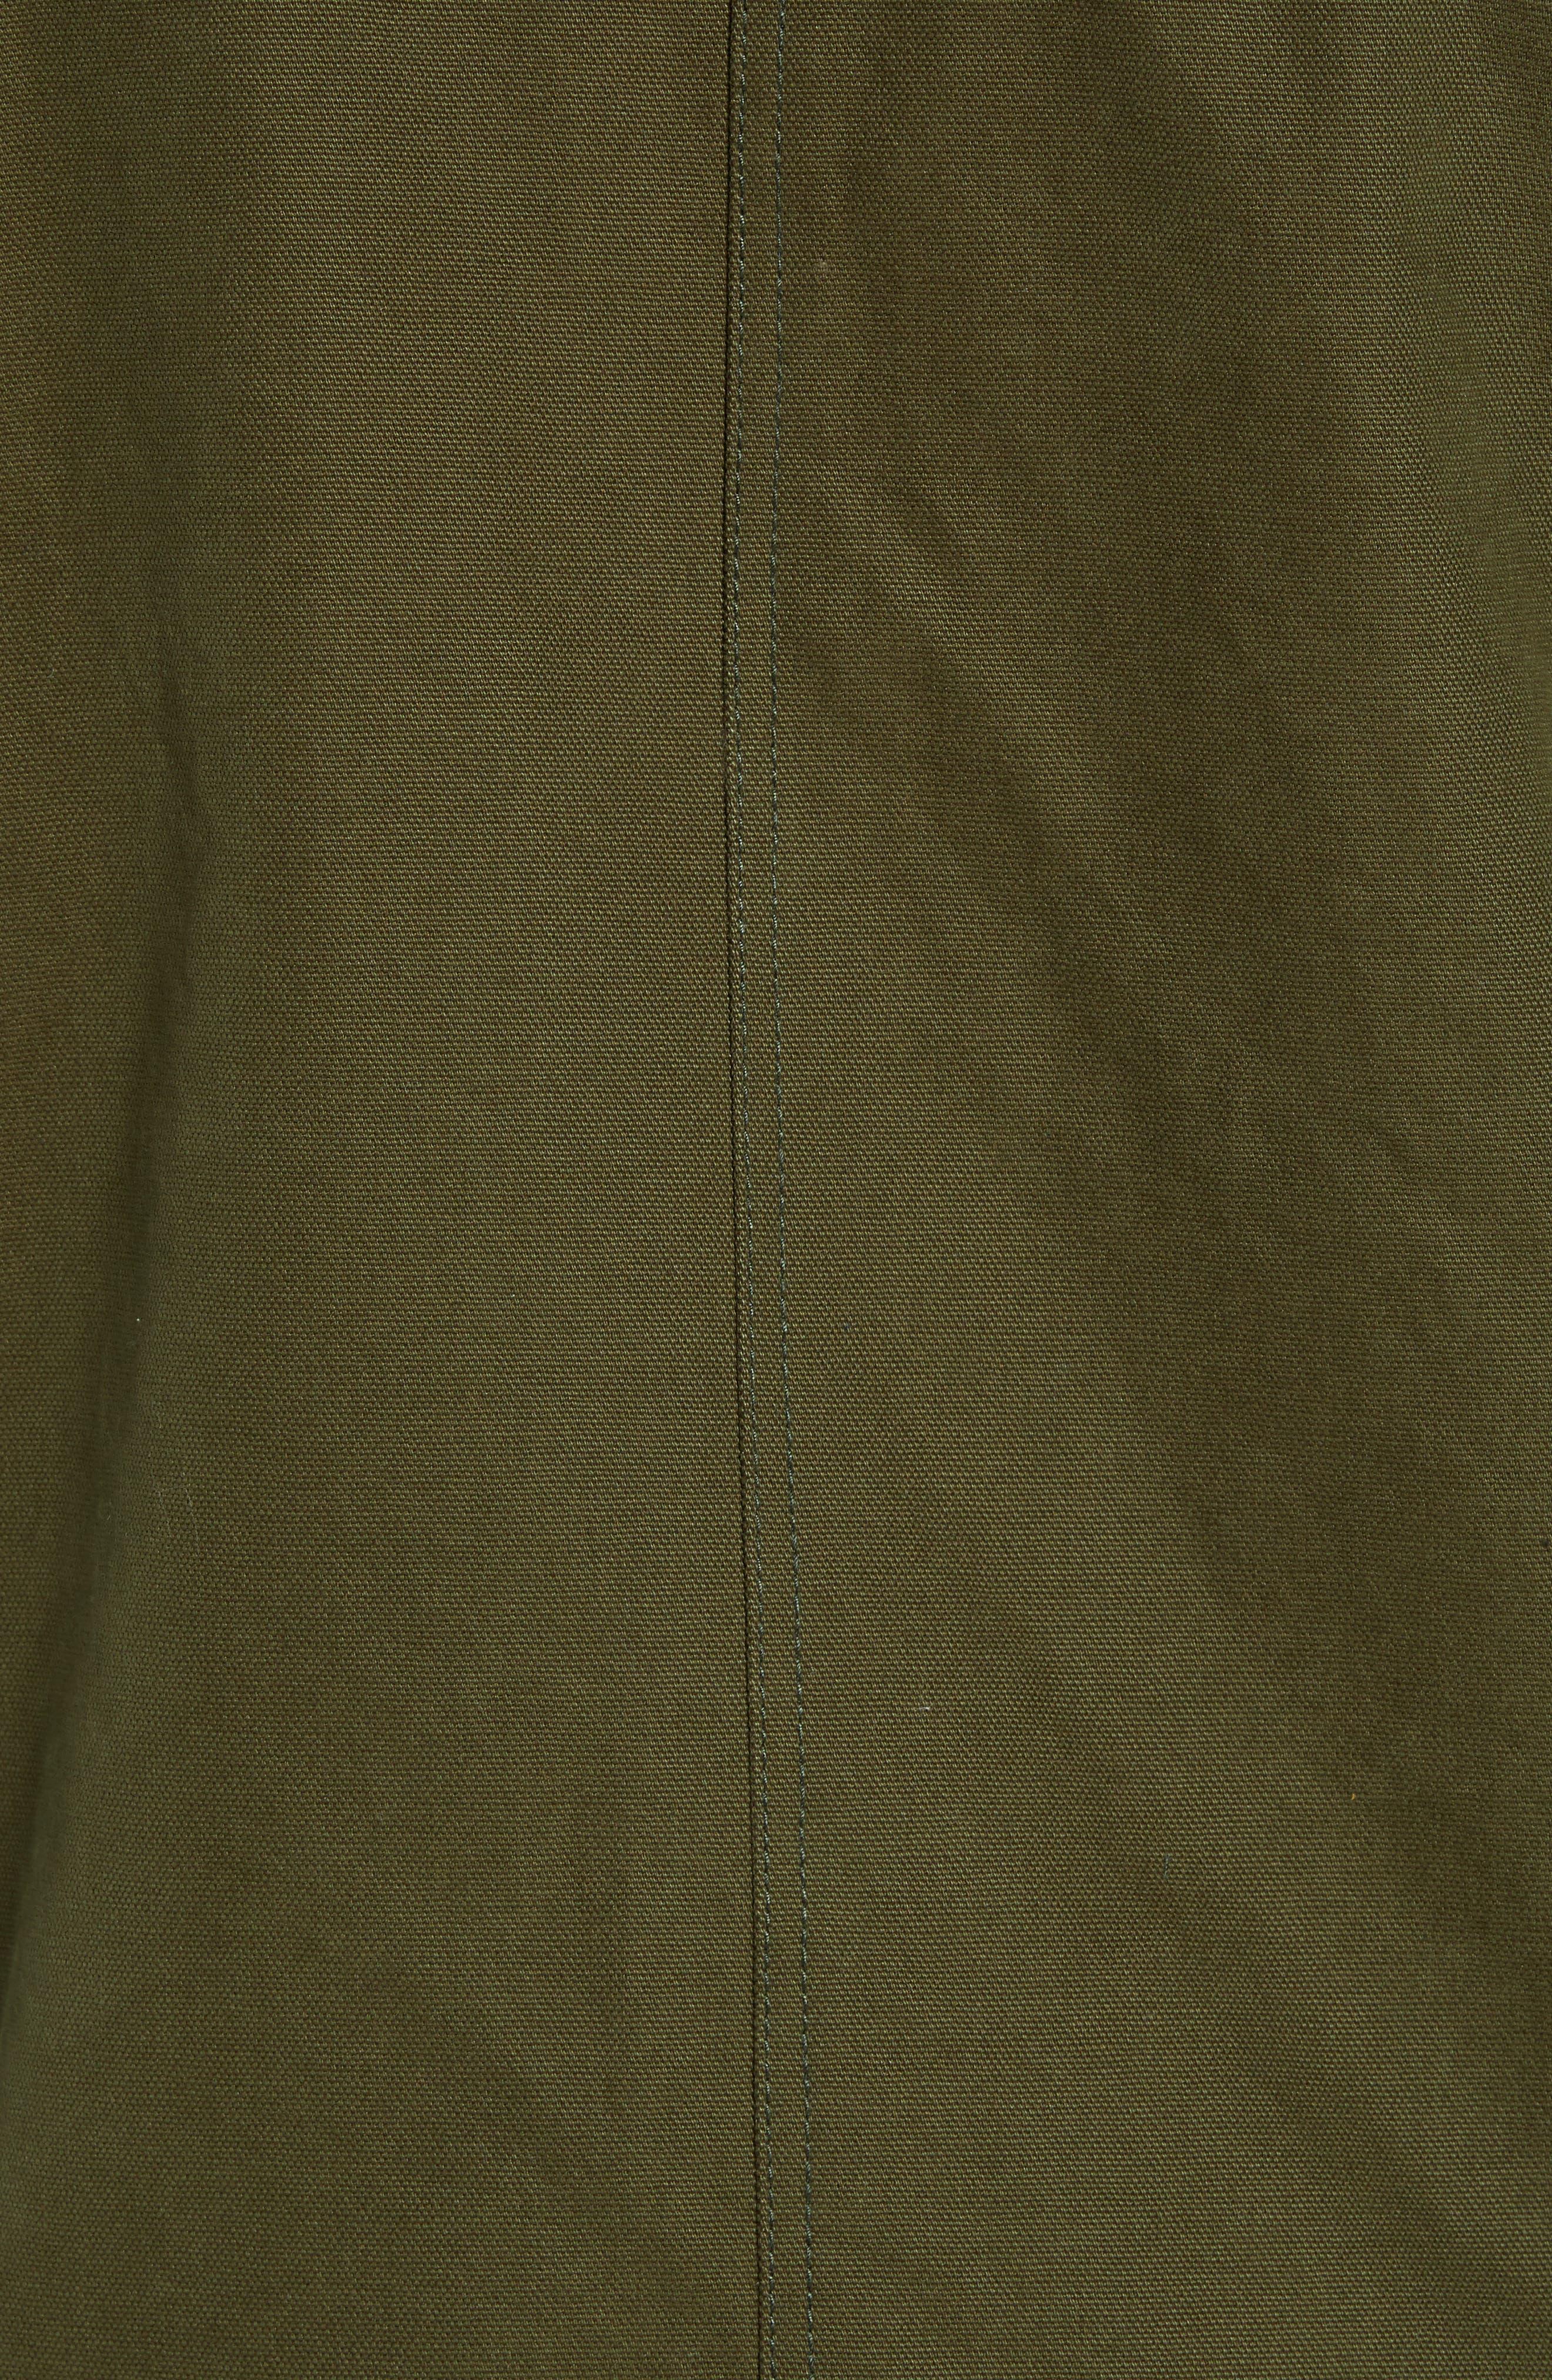 Dry Goods Cascade Raincoat,                             Alternate thumbnail 7, color,                             OLIVE